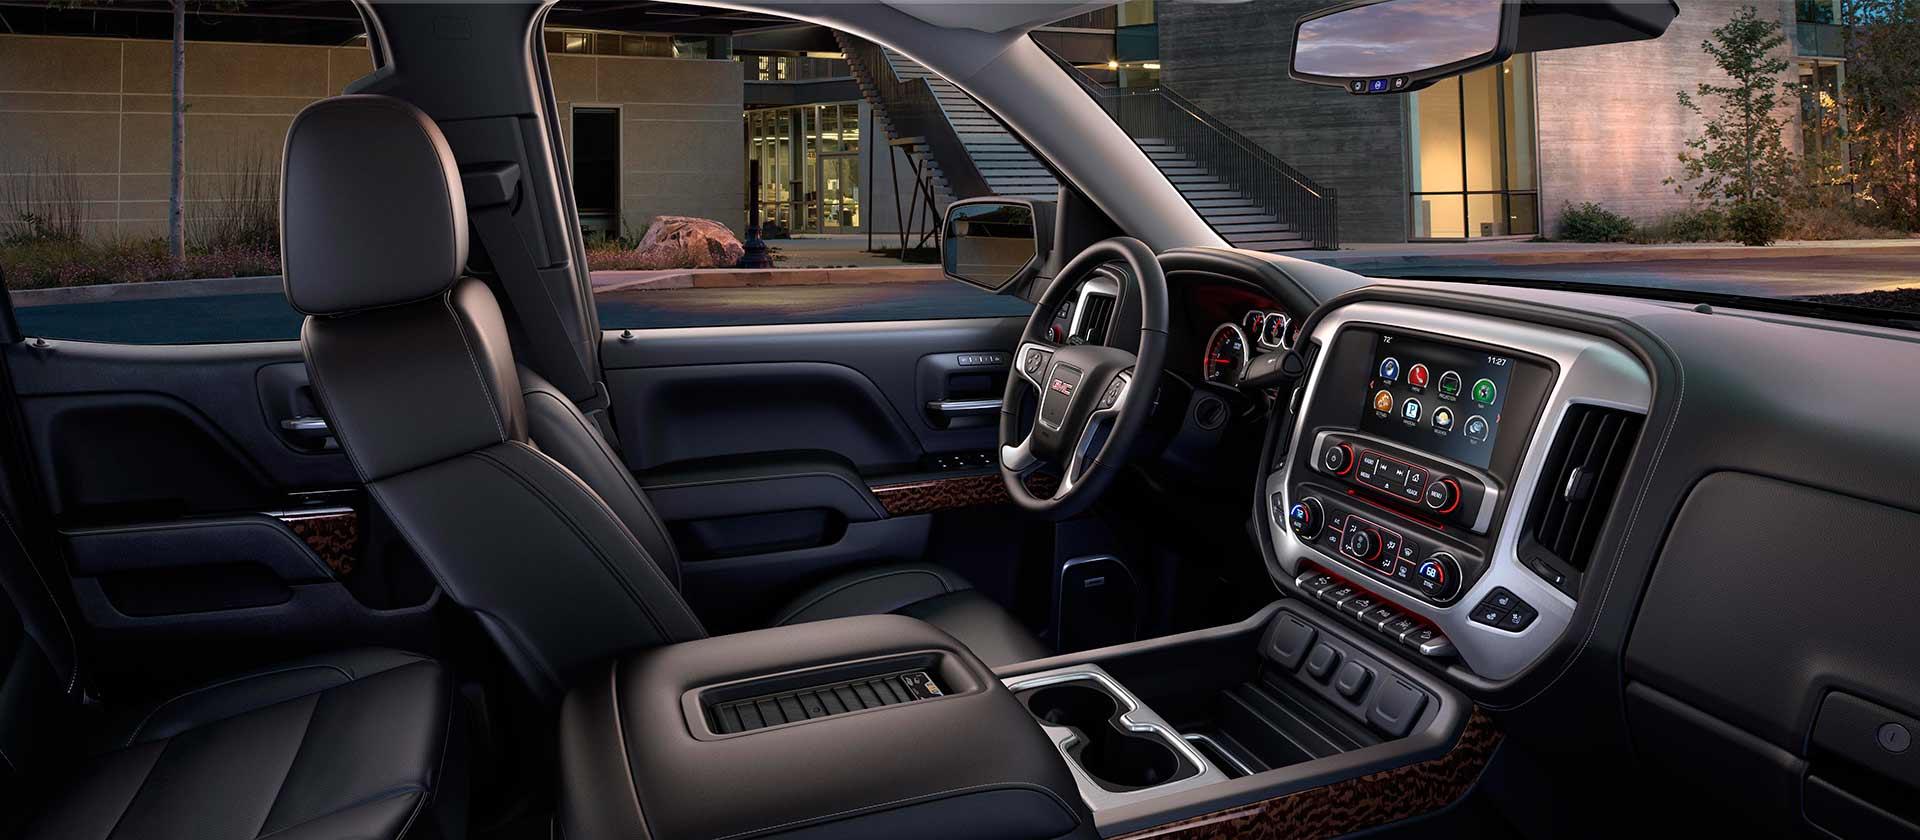 New GMC Sierra 1500 Interior image 1